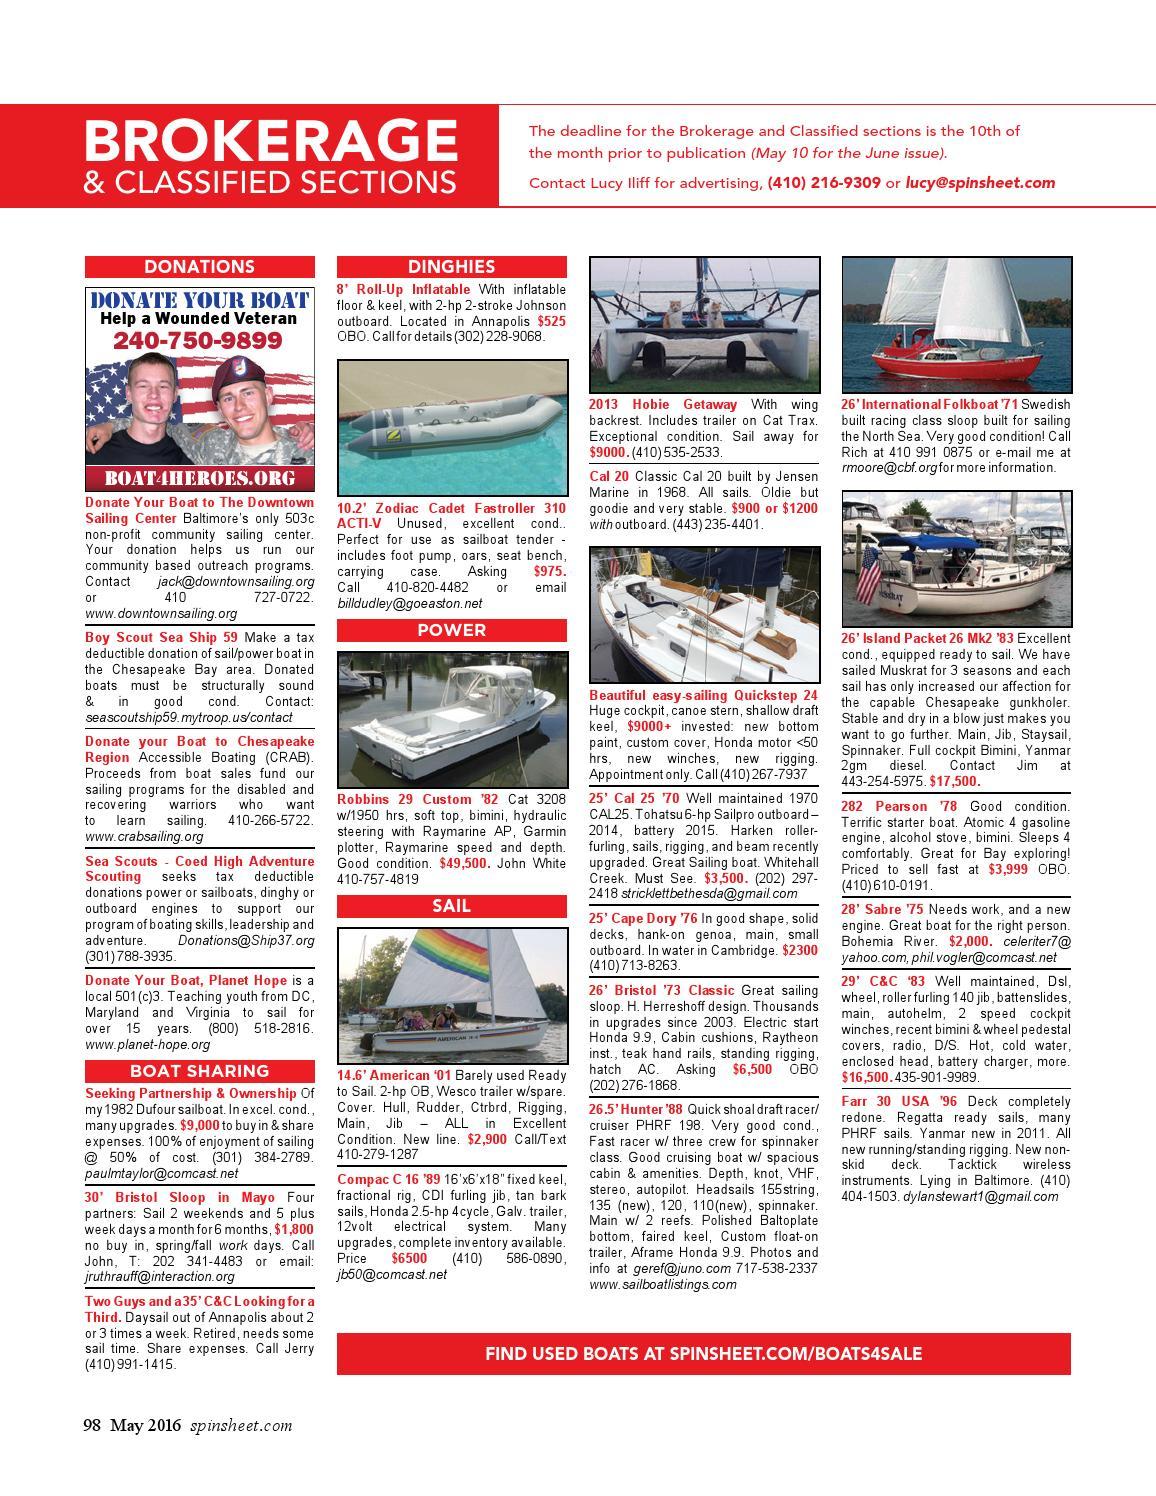 SpinSheet Magazine May 2016 by SpinSheet Publishing Company - issuu